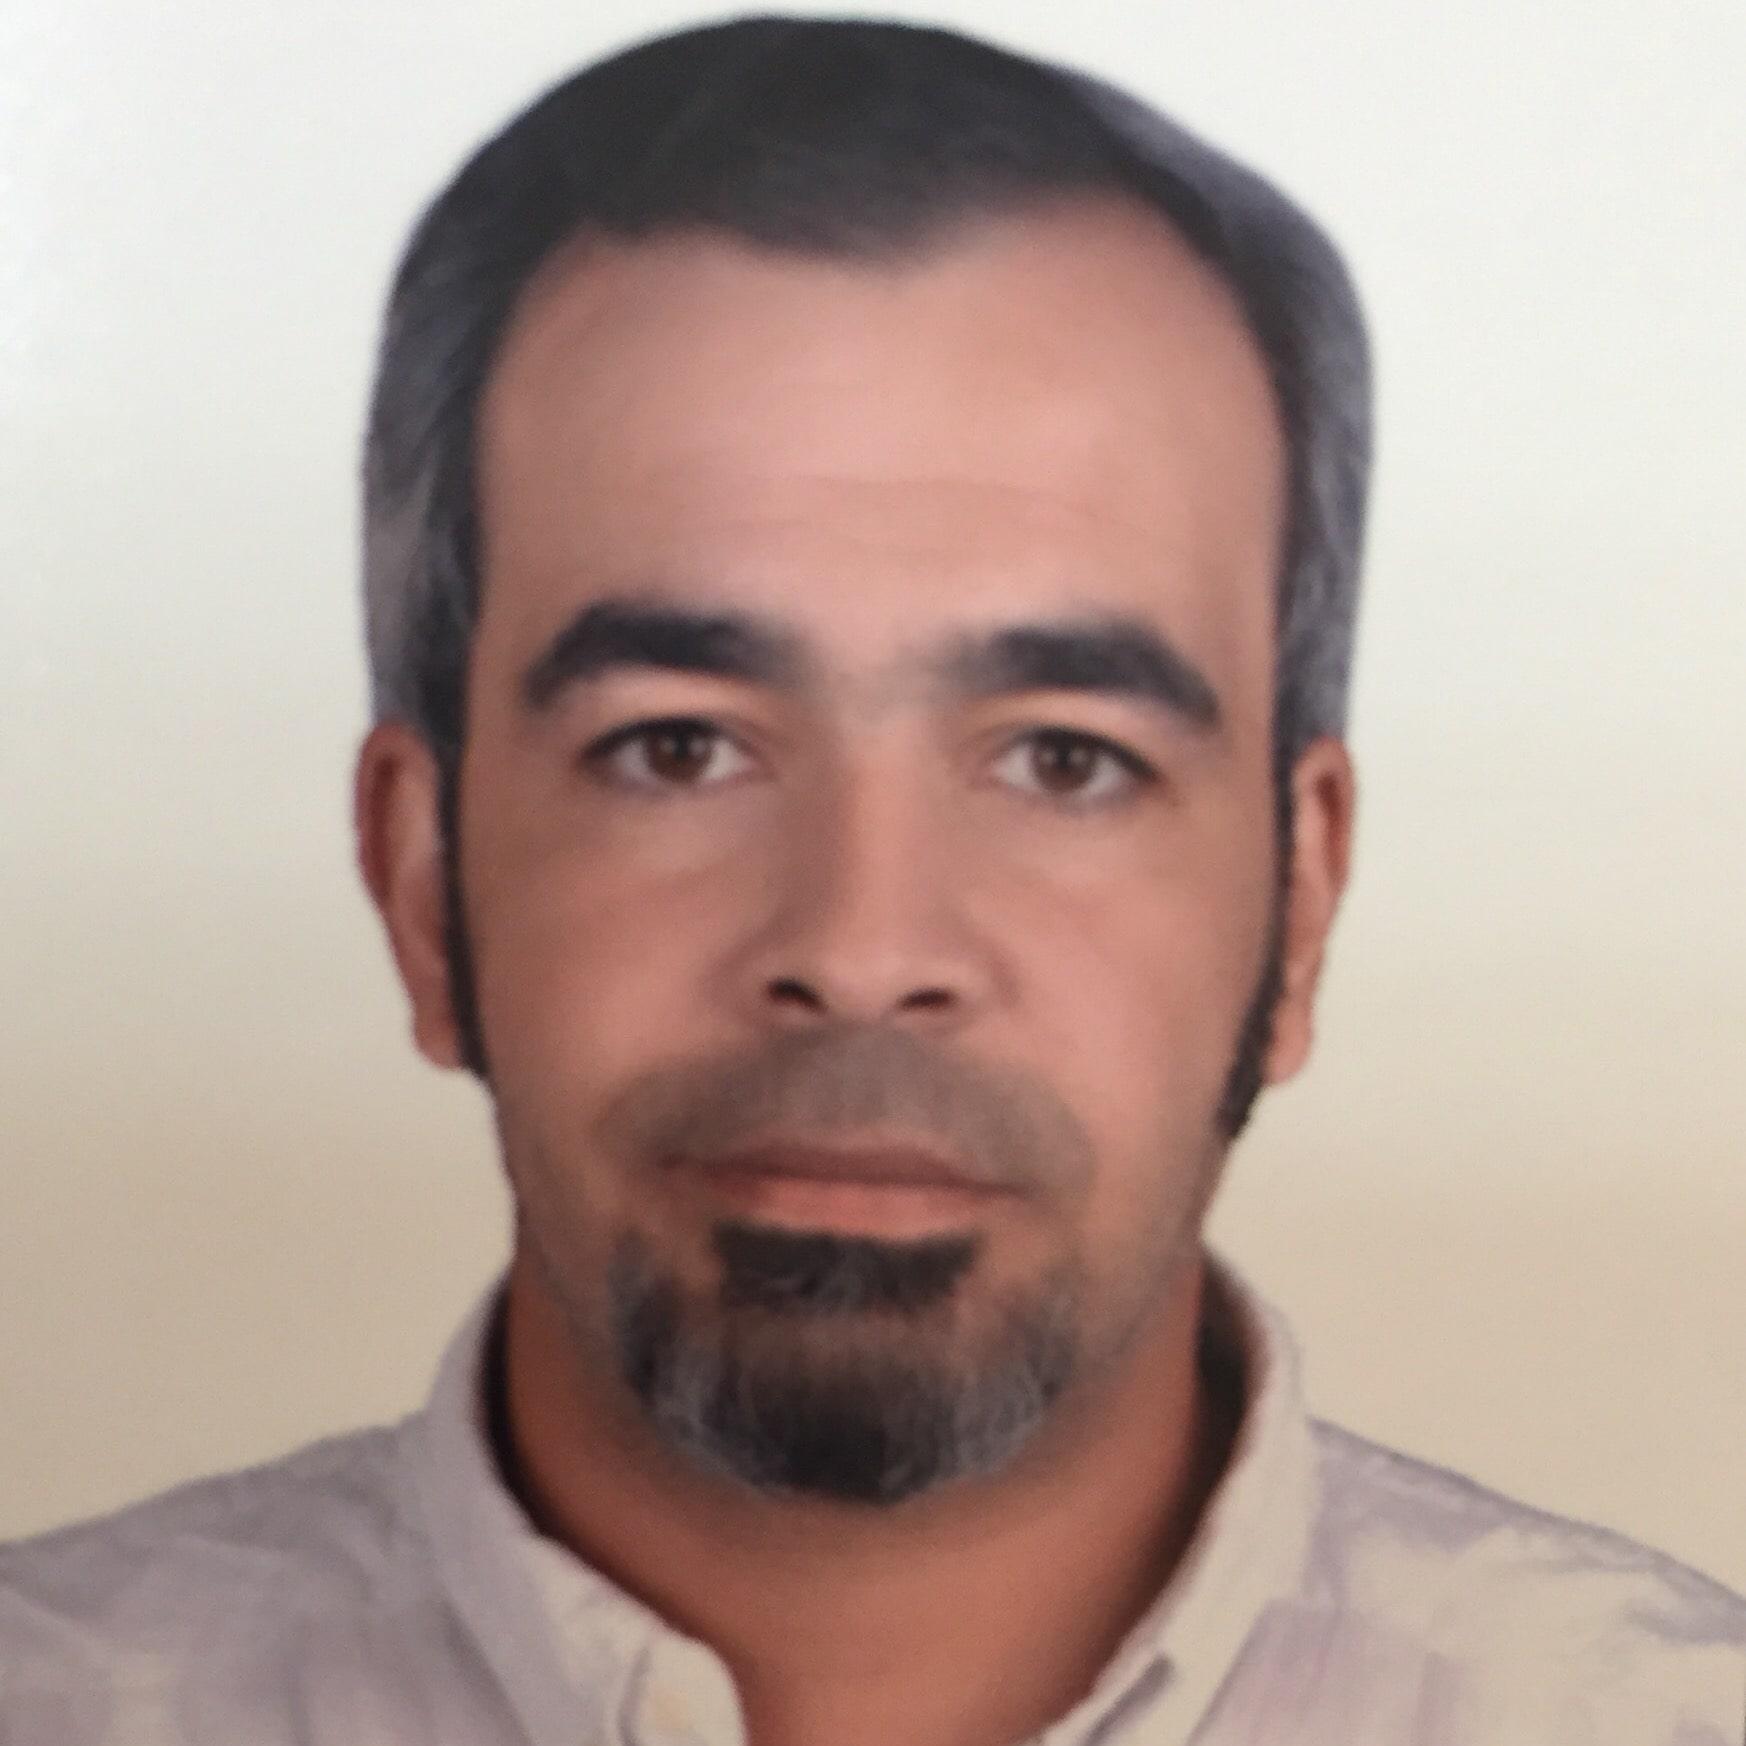 Maged Yousri